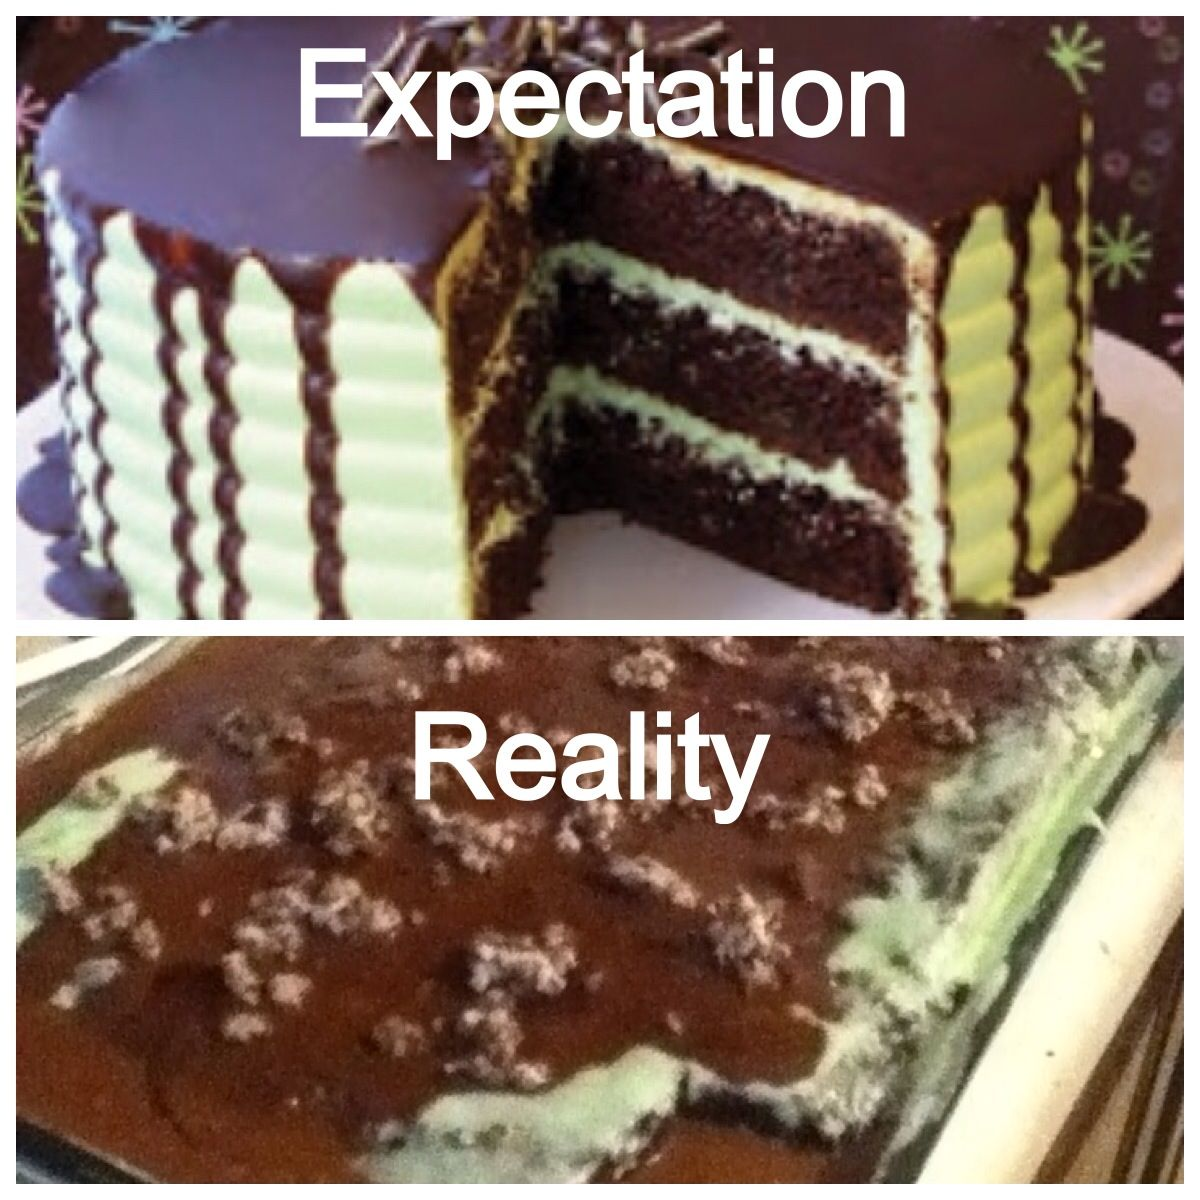 Cake Fails: Nailed It!: 5 Hilarious Birthday Cake Fails